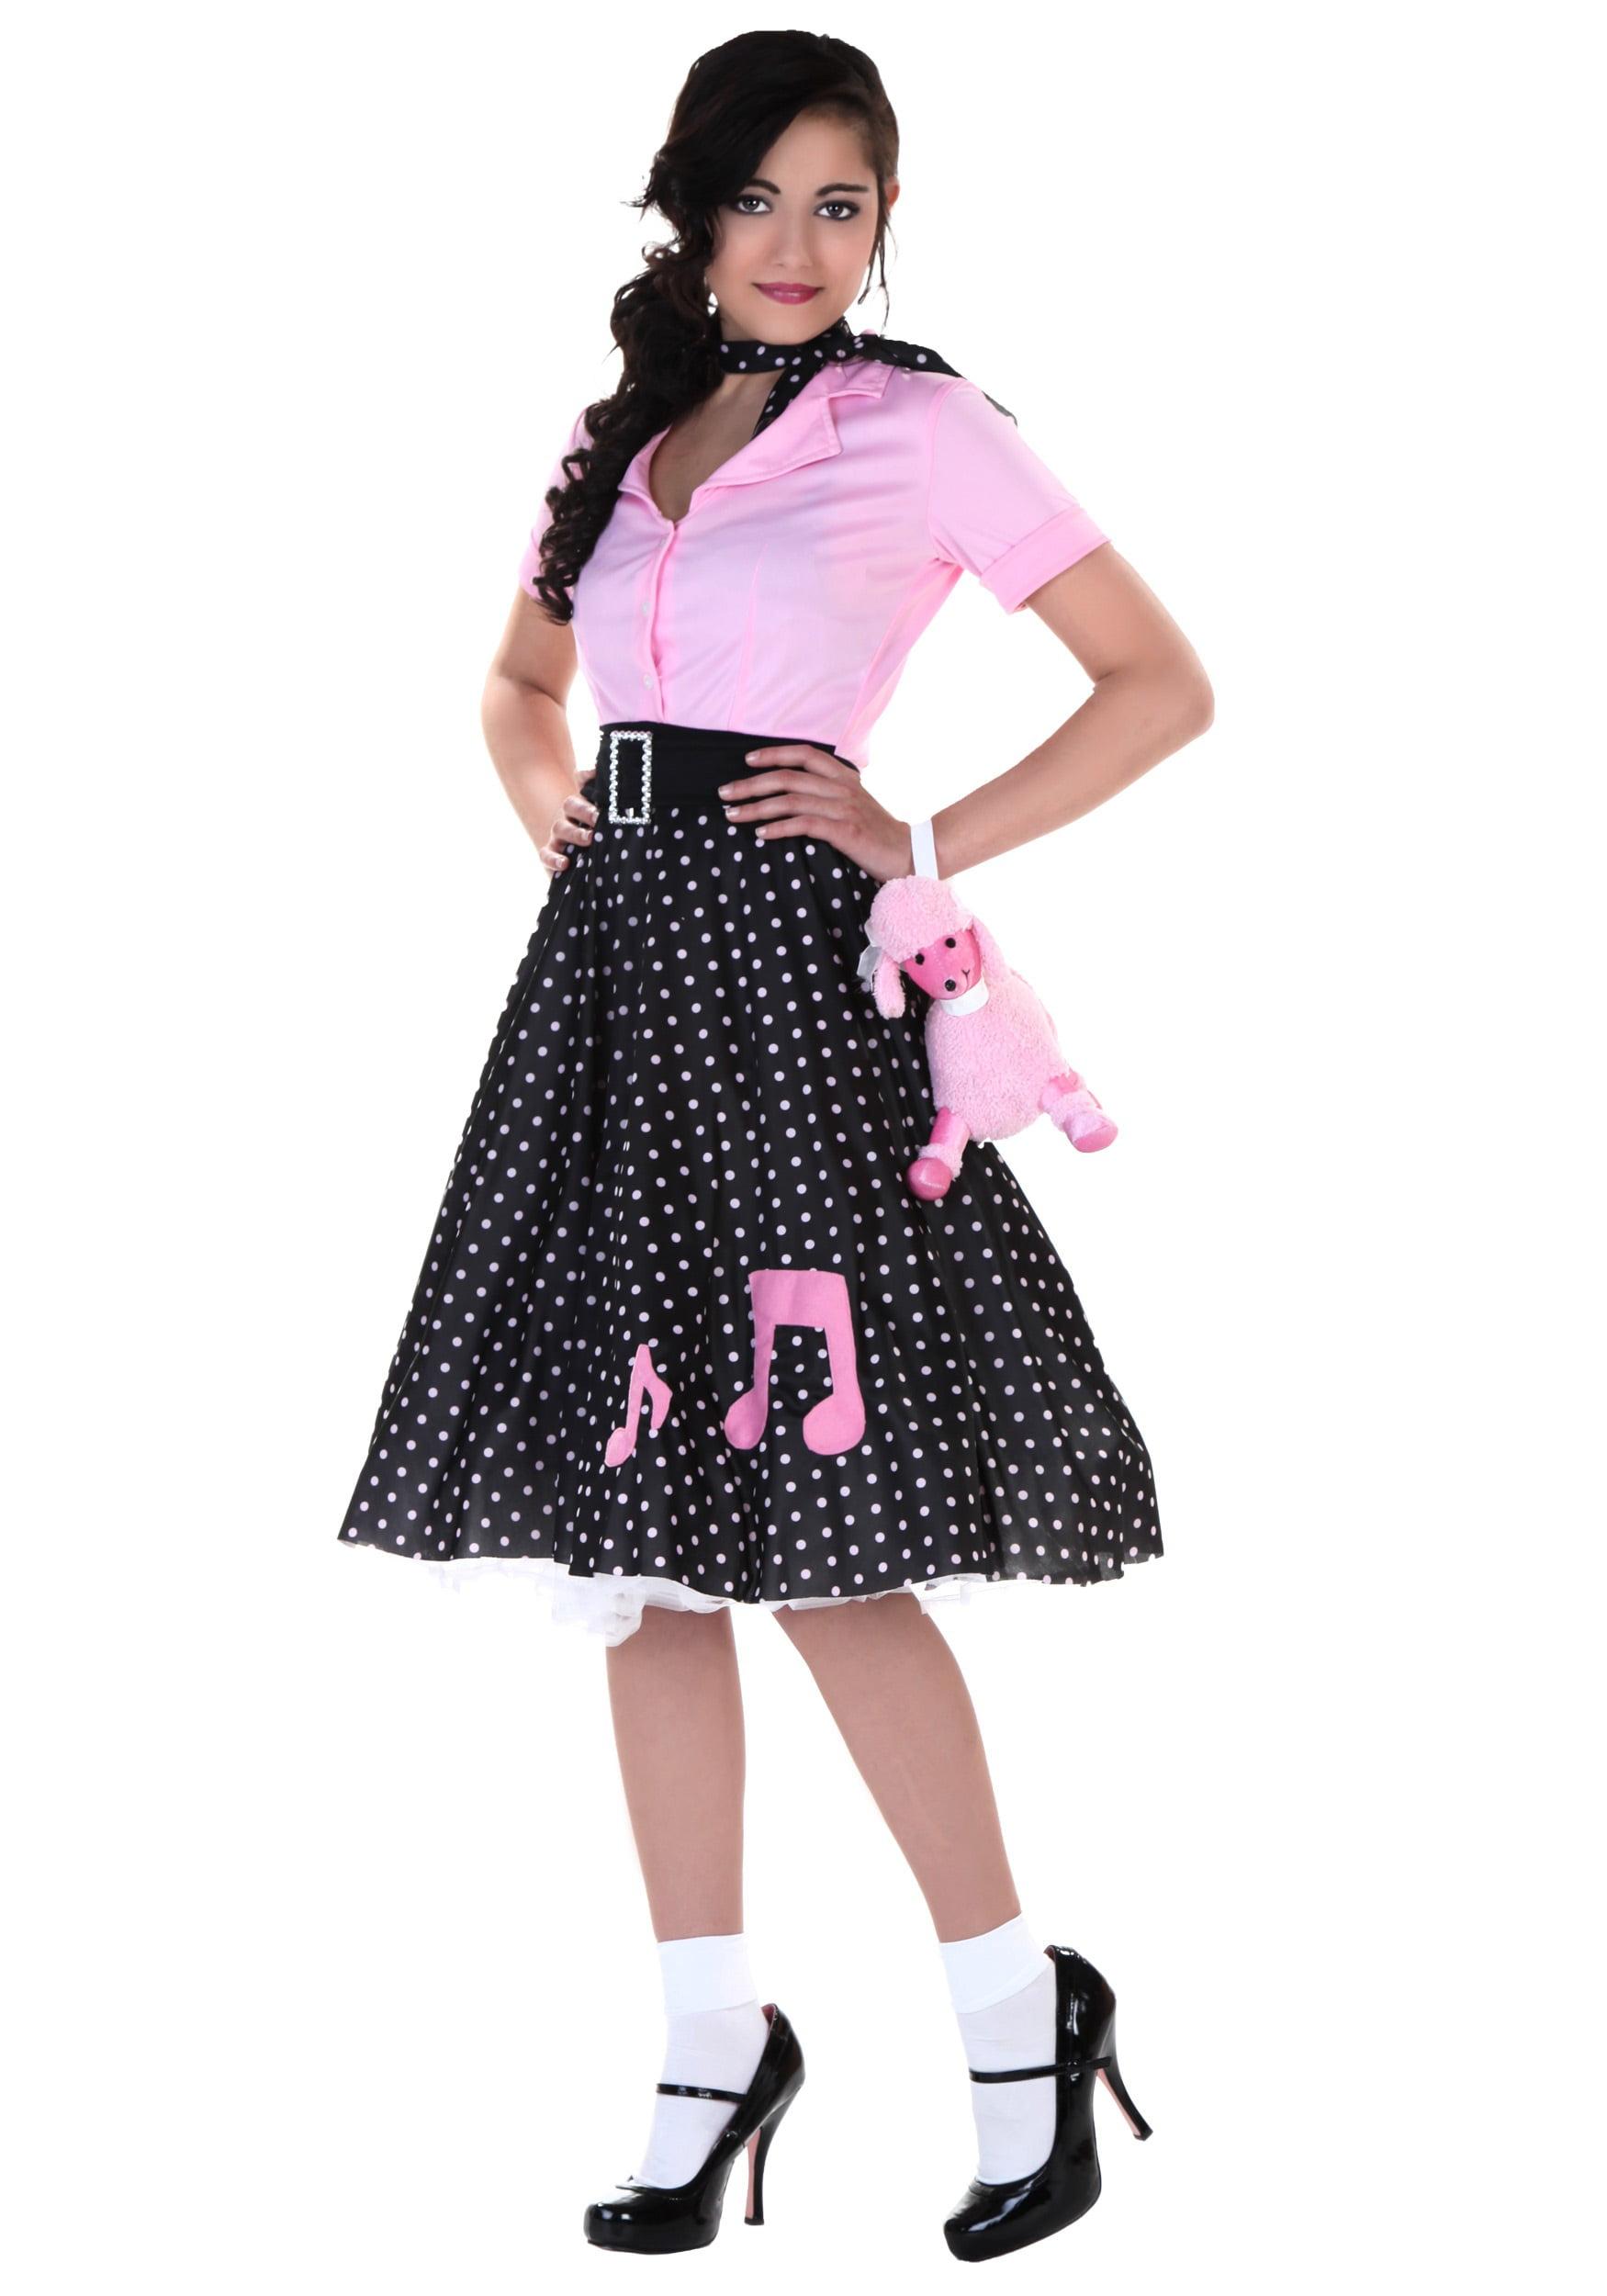 Sock Hop Cutie Costume - Walmart.com